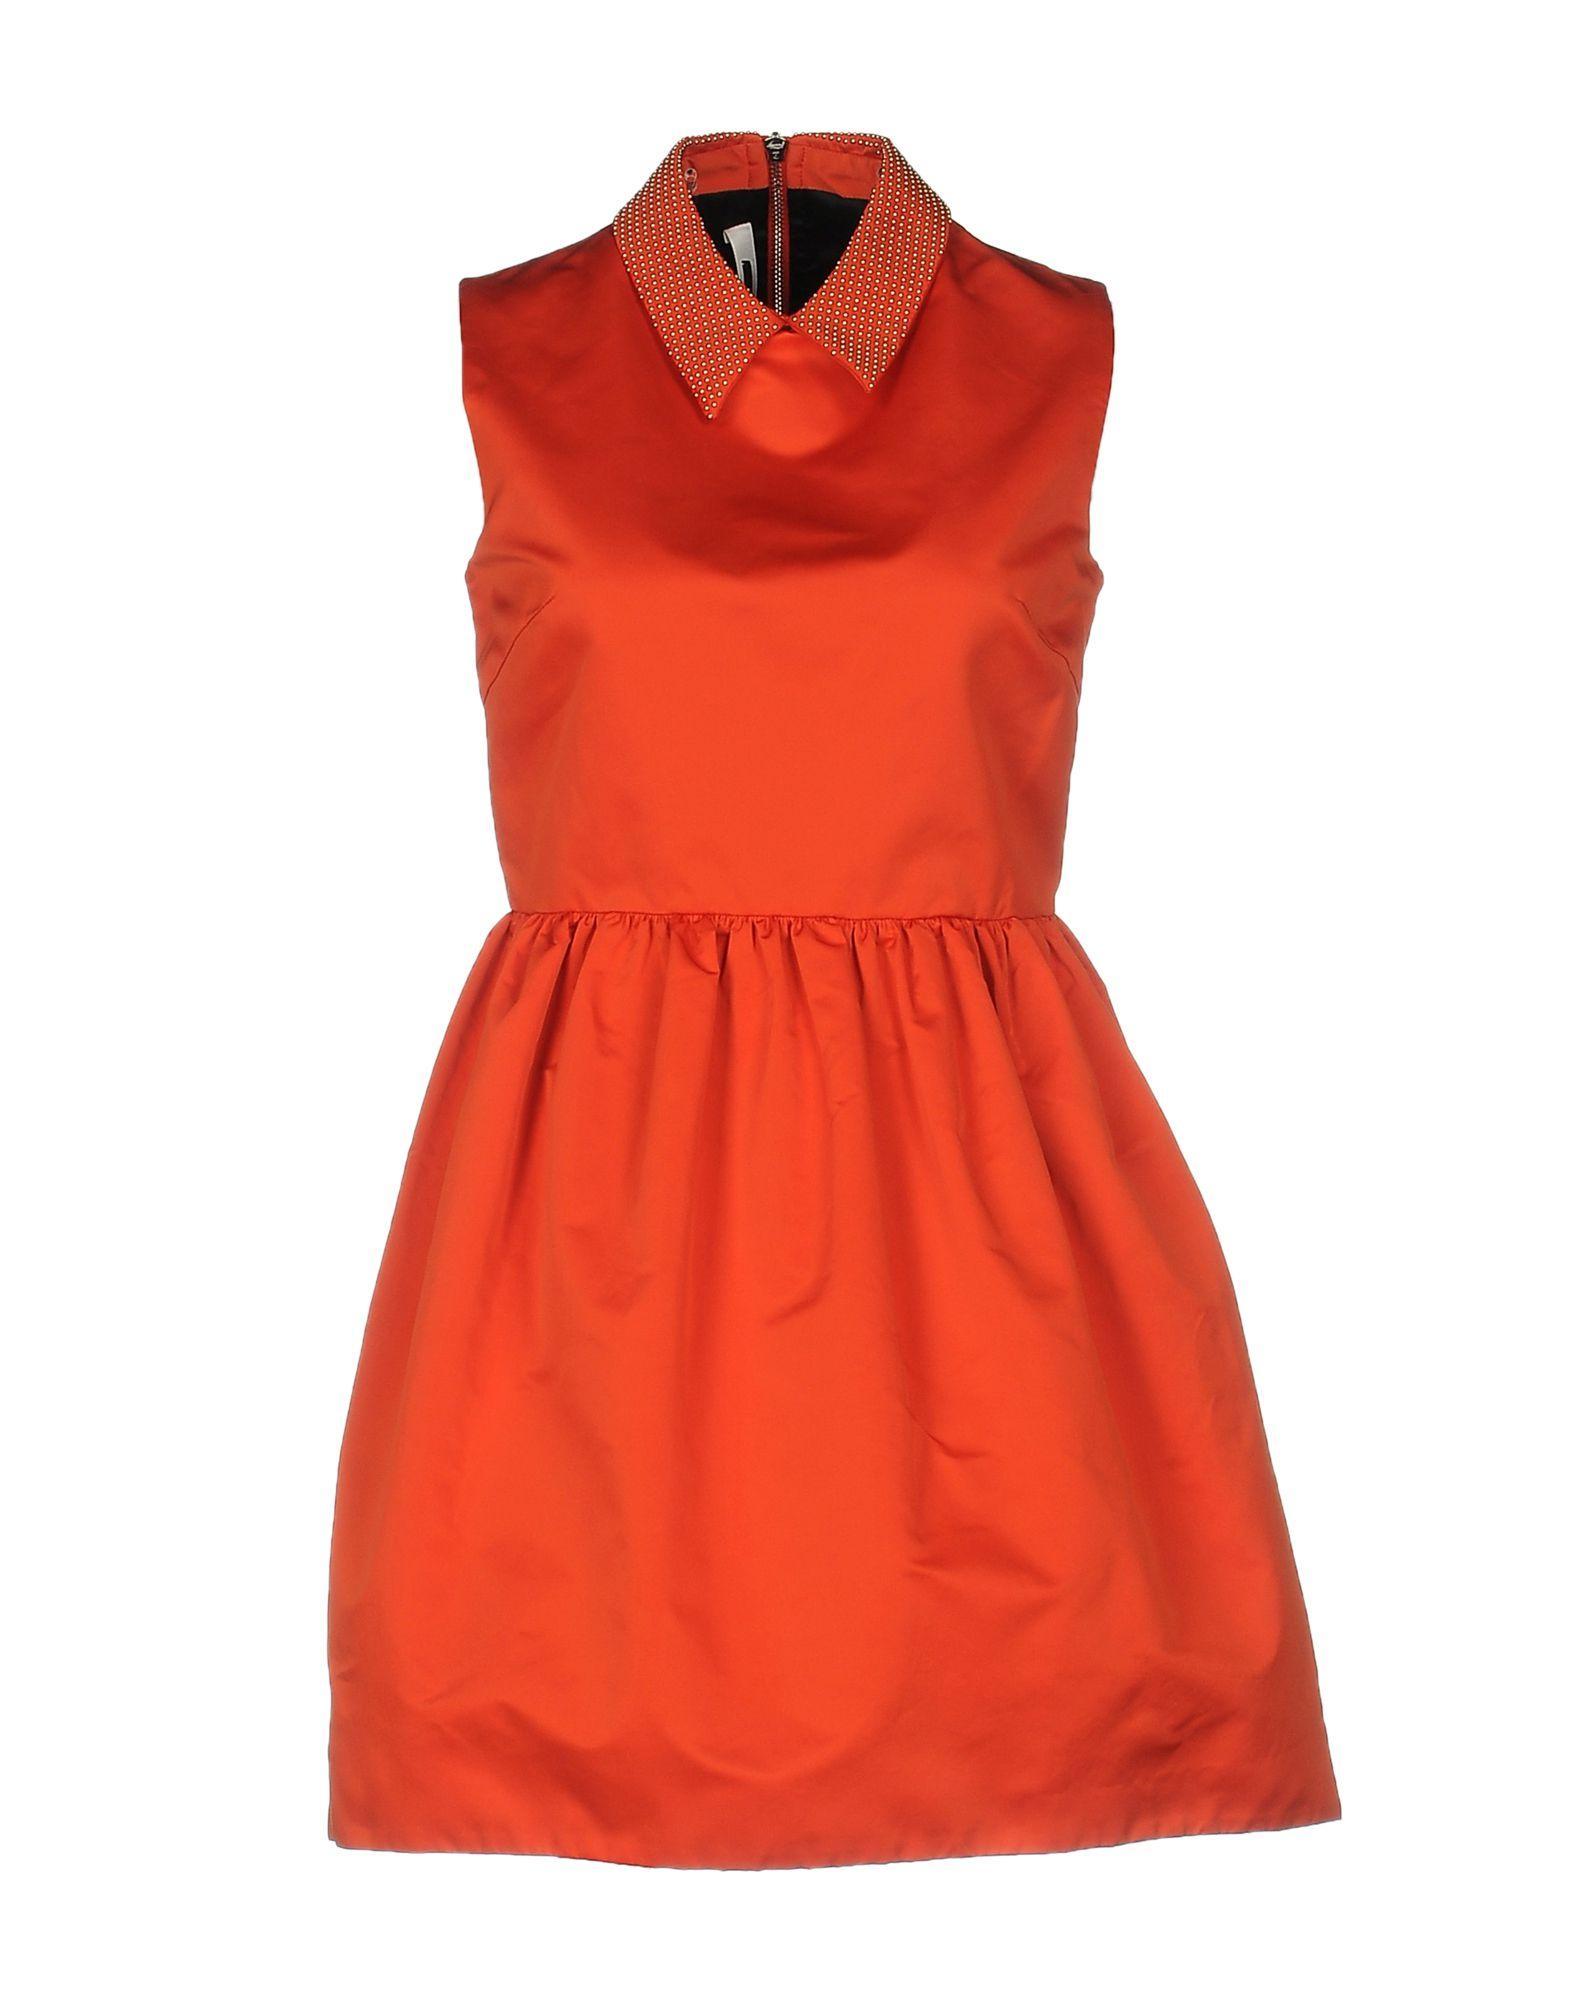 Mcq alexander mcqueen Short Dress in Red